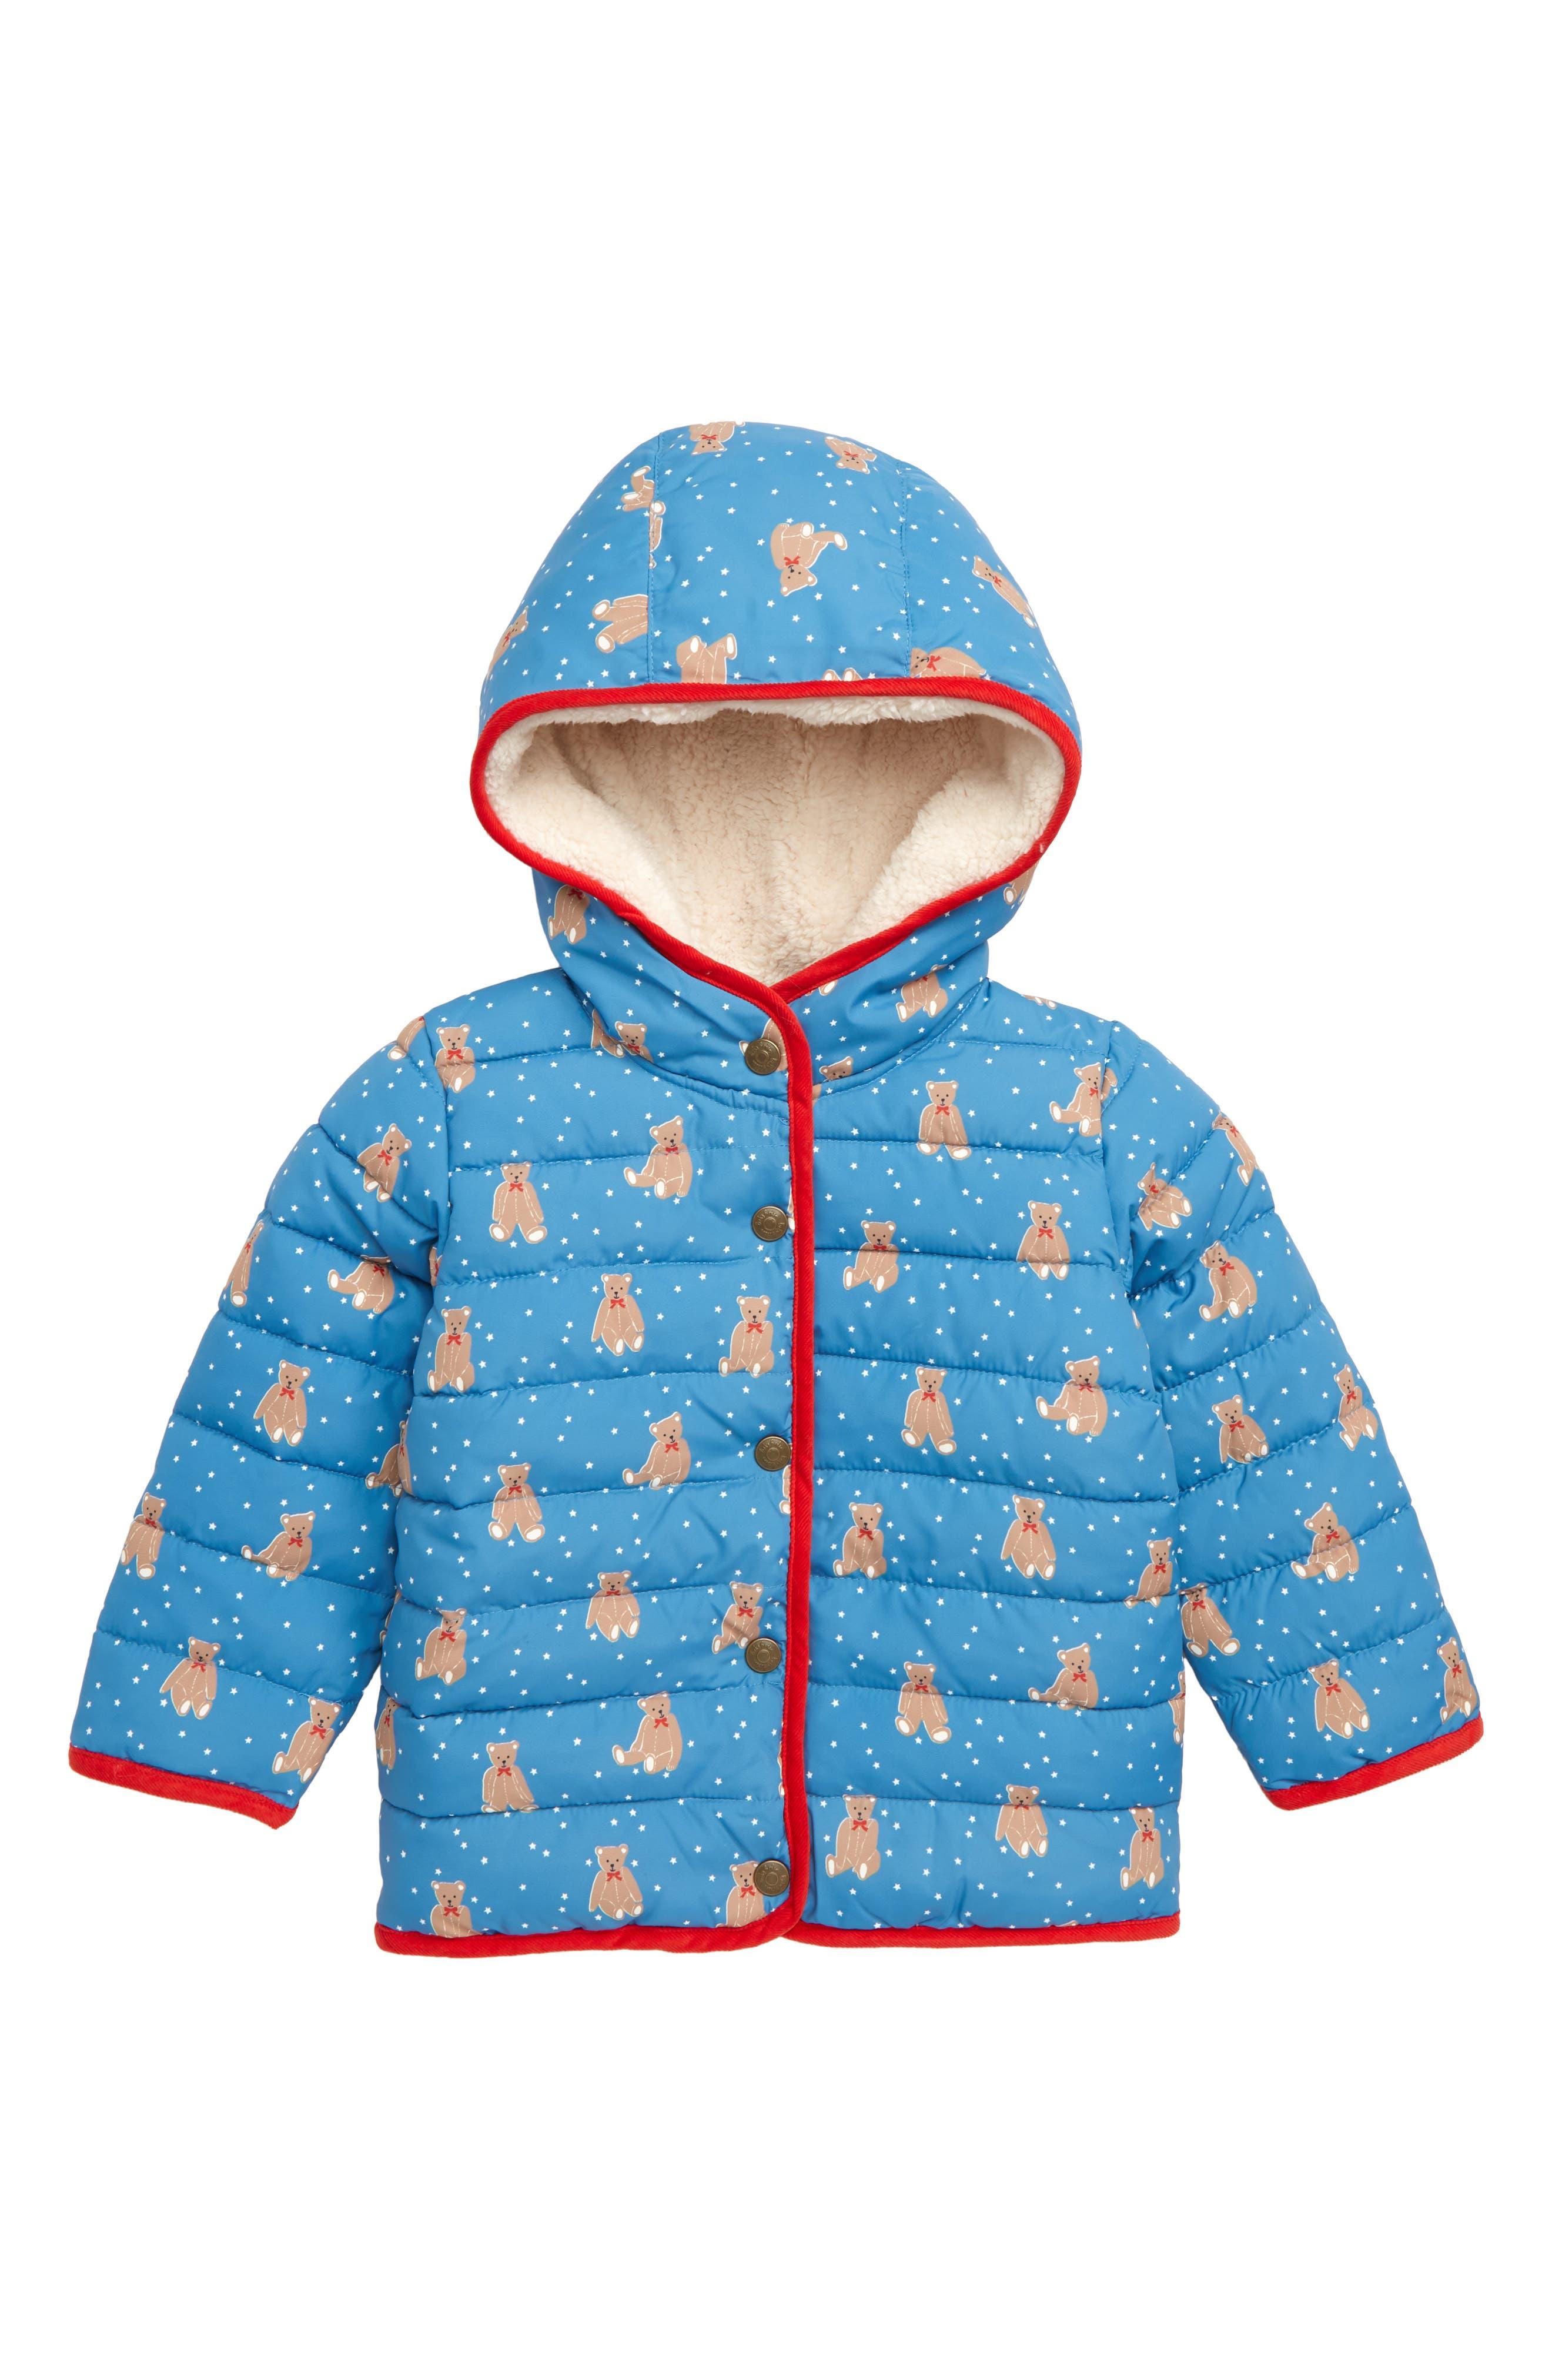 MINI BODEN Babysaurus Water Resistant Quilted Puffer Coat, Main, color, BLU AZURE BLUE BABY BEARS